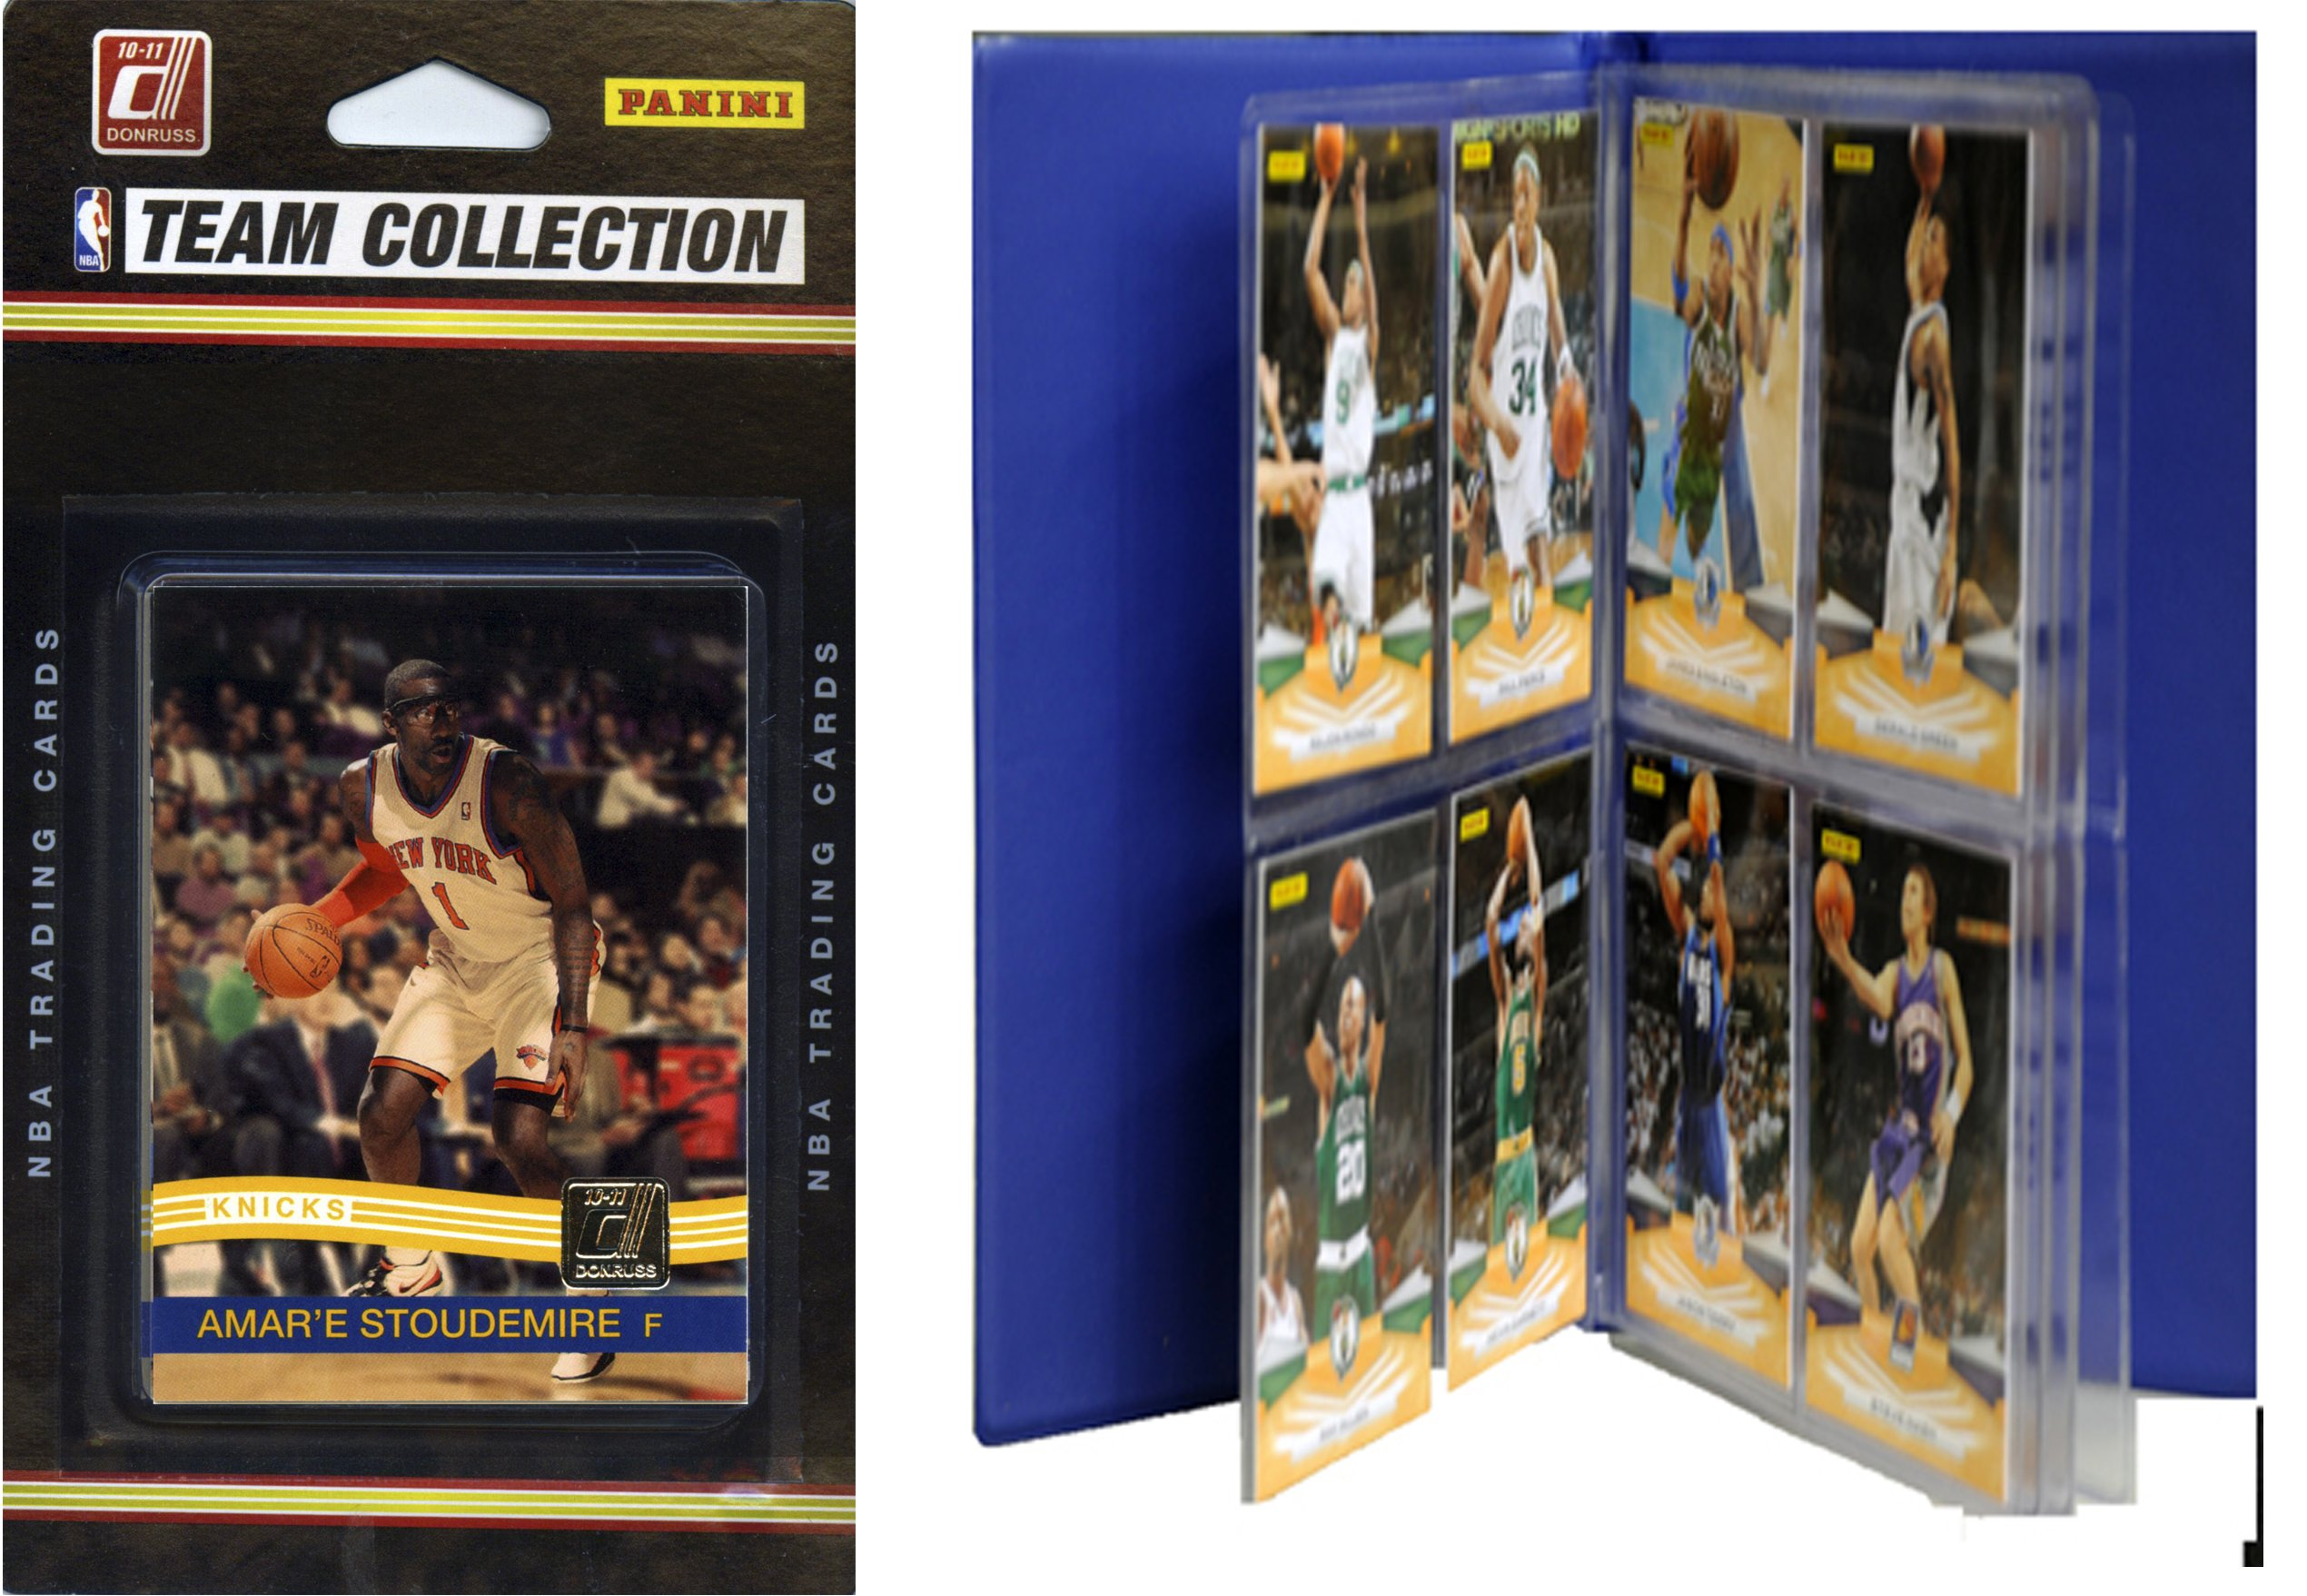 NBA New York Knicks Licensed 2010-11 Donruss Team Set Plus Storage Album